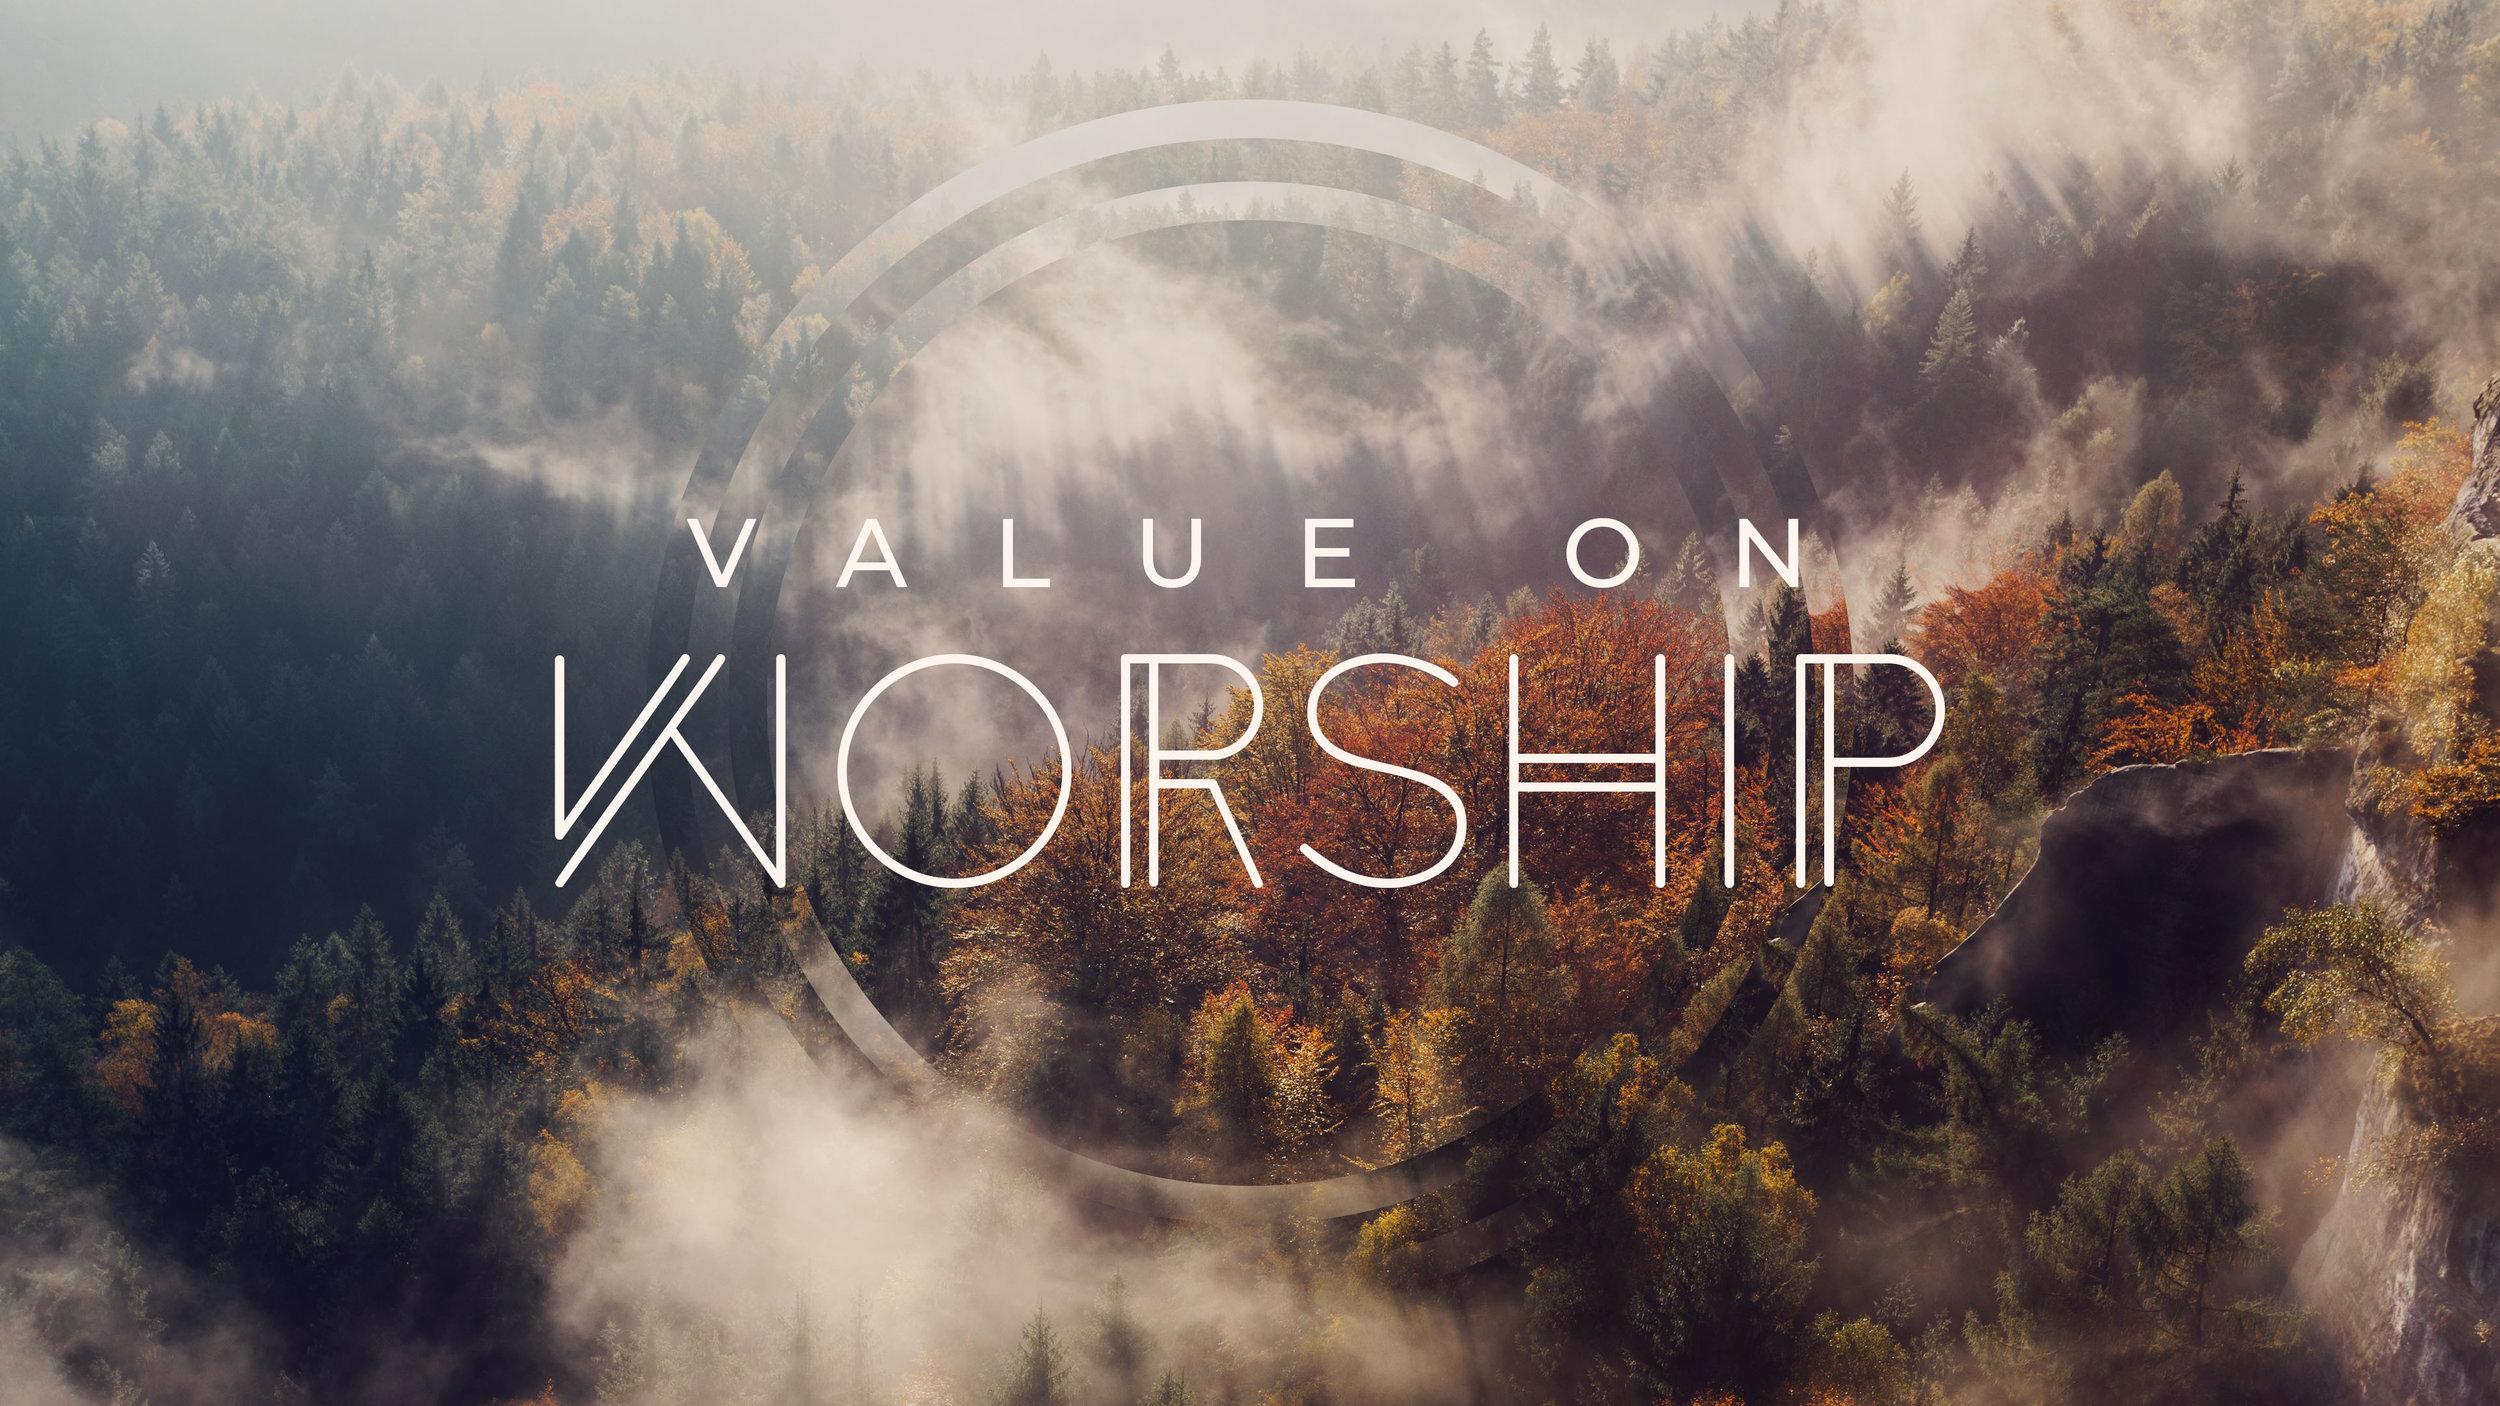 Value on Worship Sermon Slide.jpg